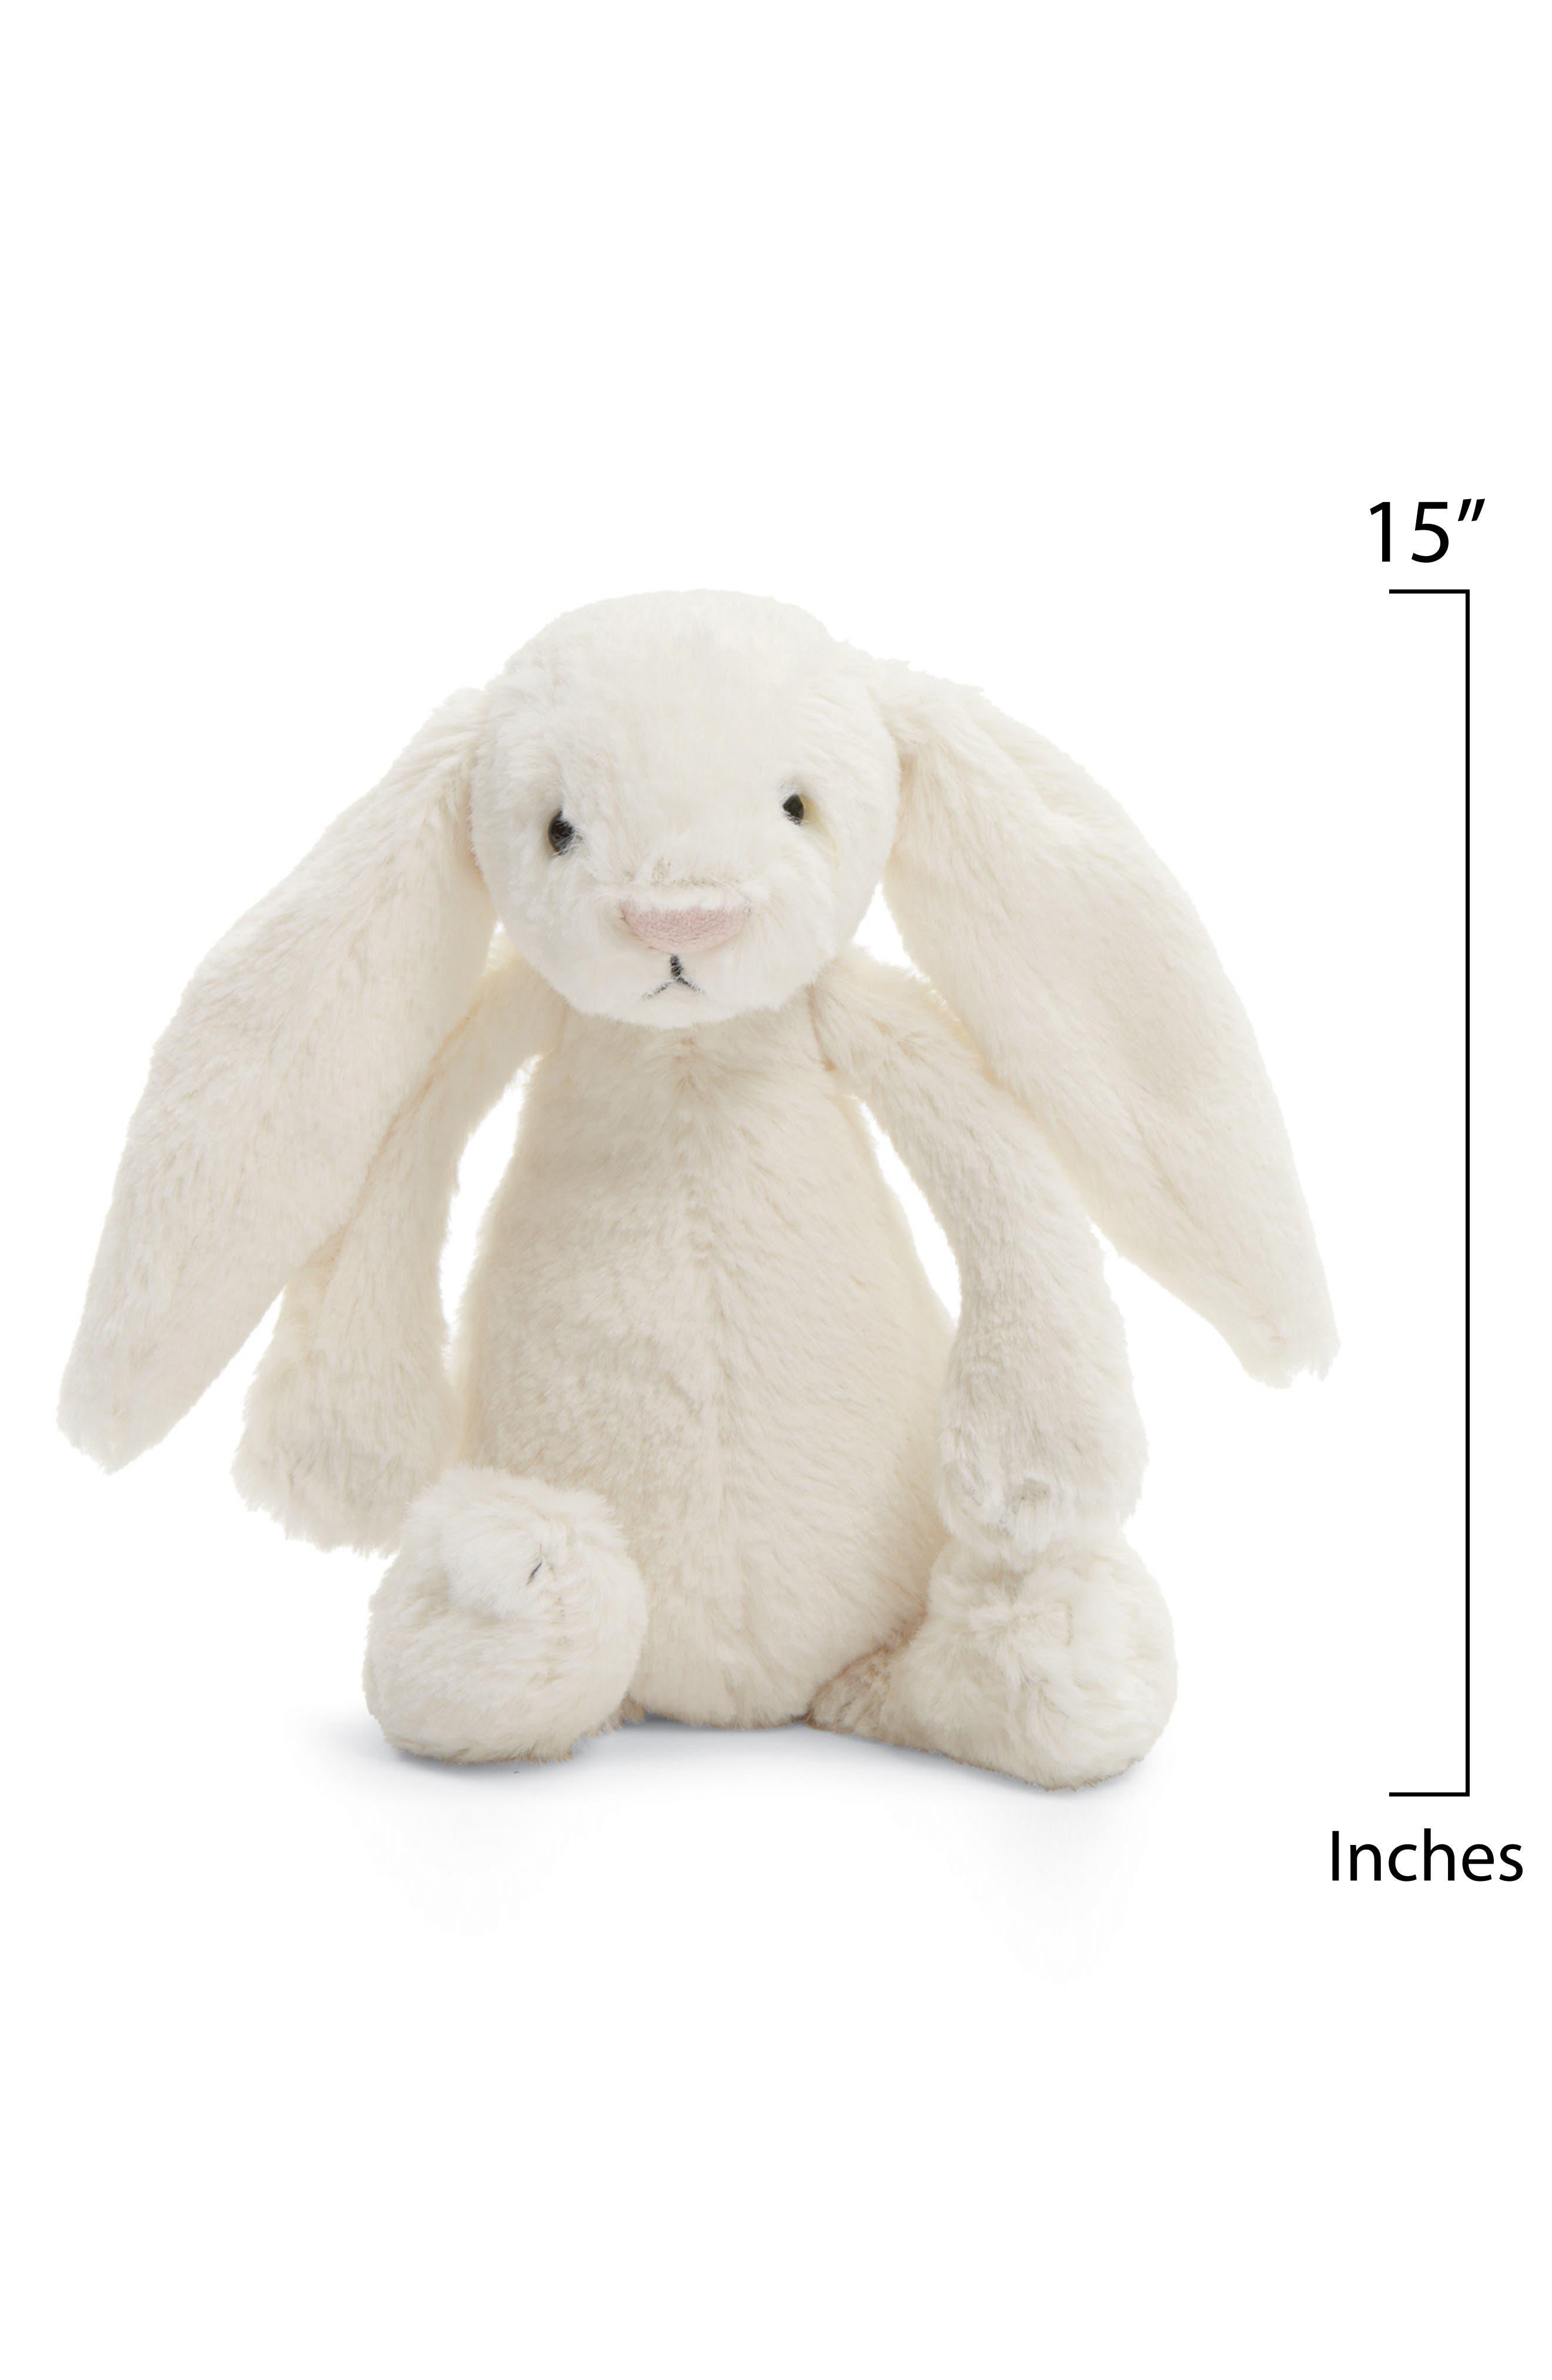 'Large Bashful Bunny' Stuffed Animal,                             Alternate thumbnail 2, color,                             900